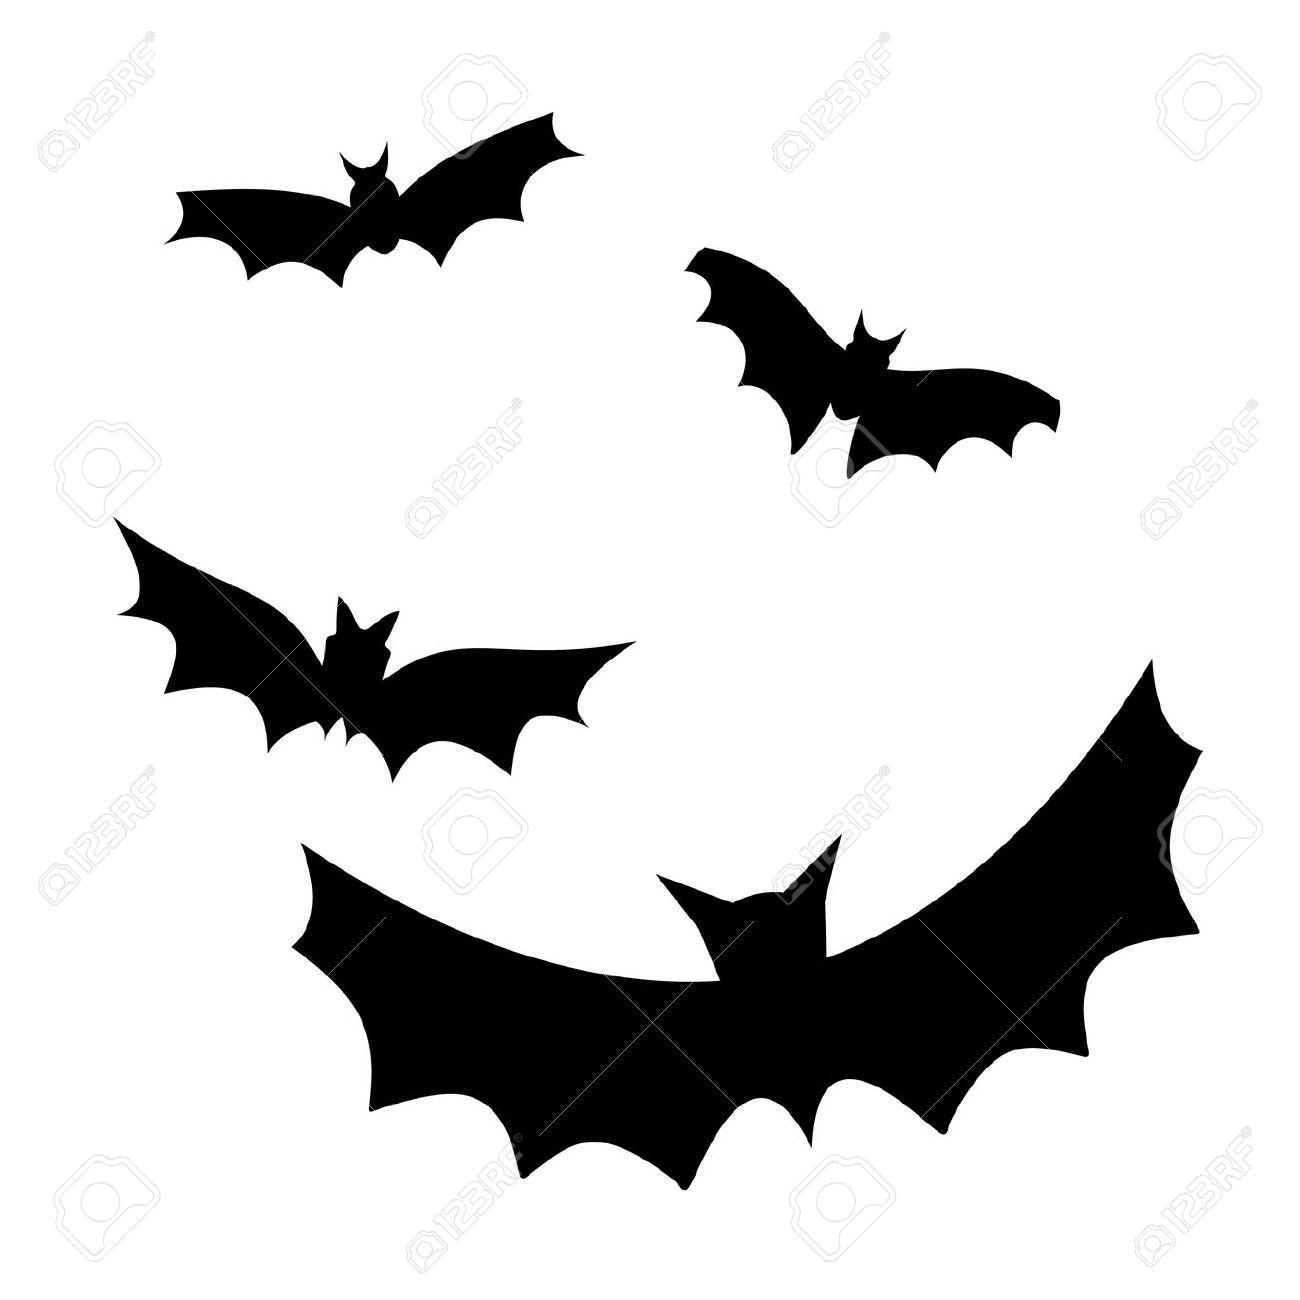 A Picture Of A Cartoon Bat cartoon pictures of bats   free download best cartoon